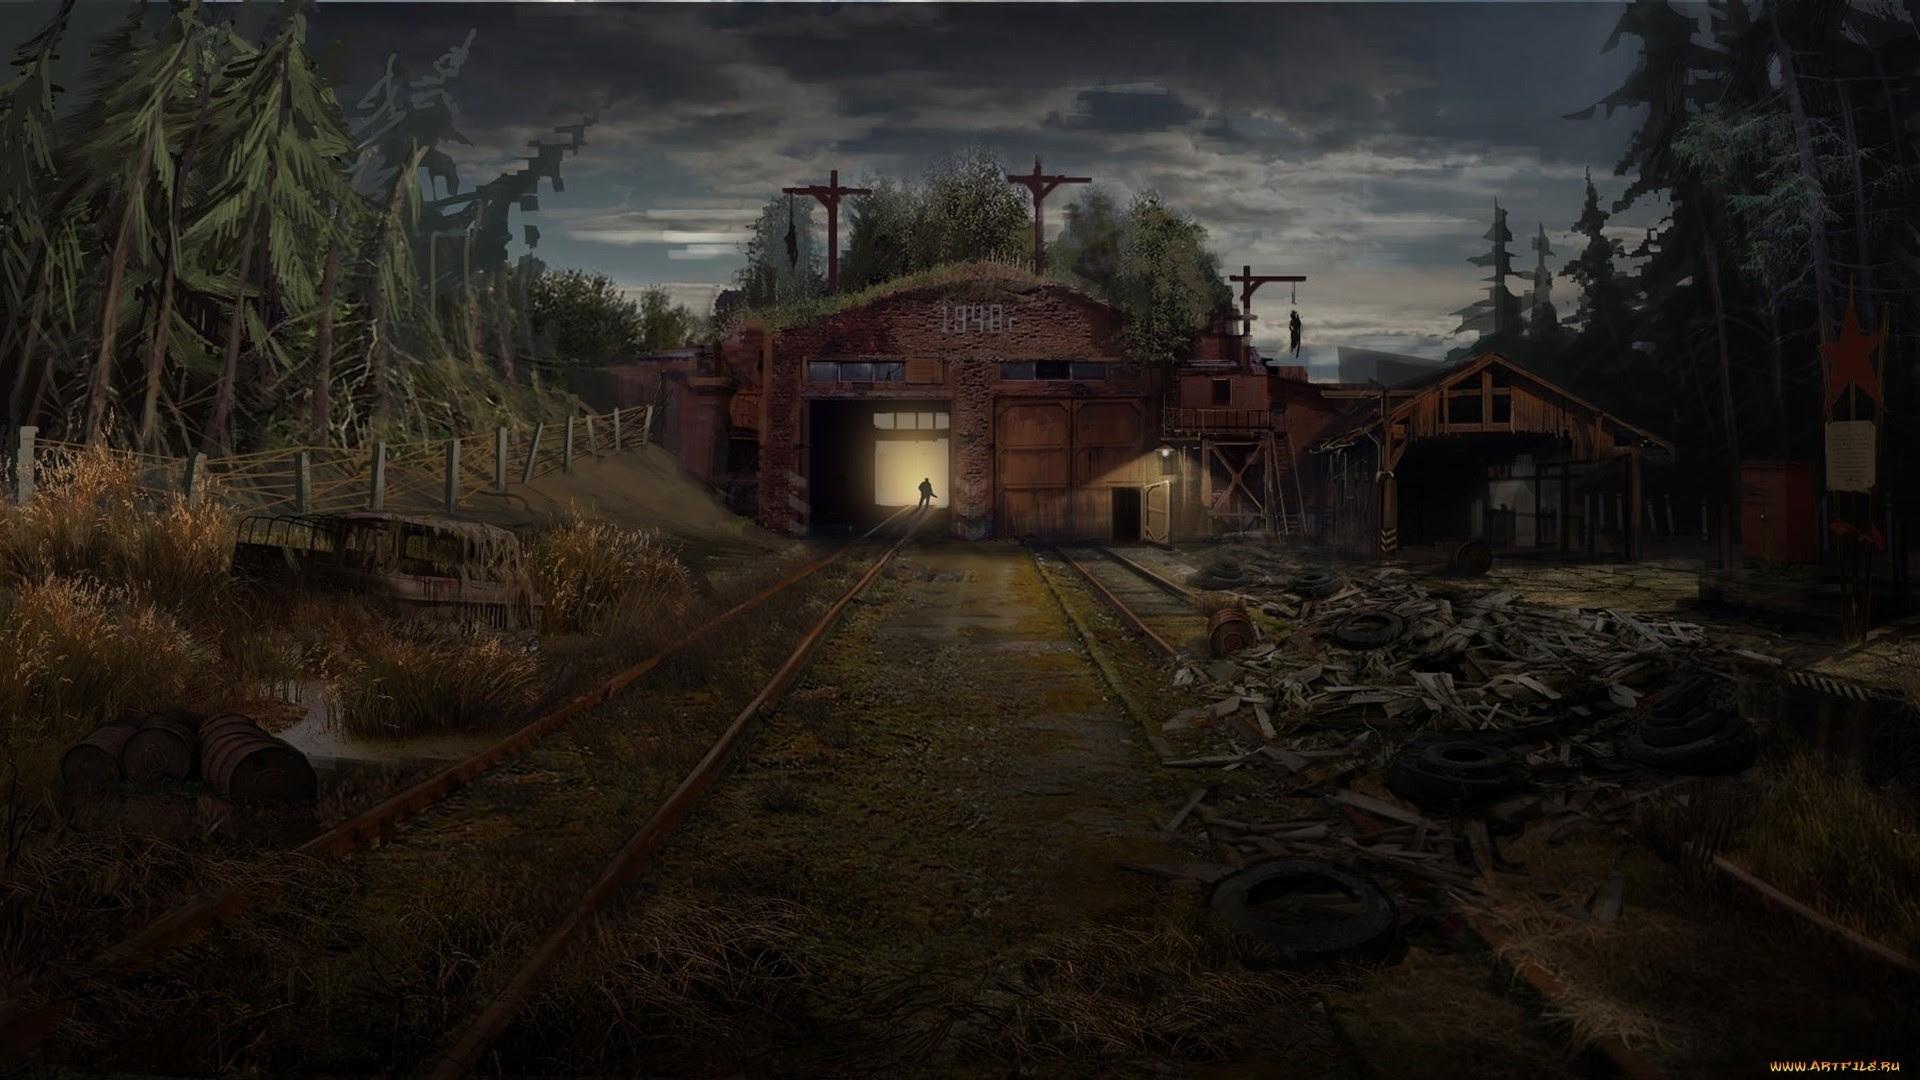 Post Apocalypse Wallpaper (83+ images)